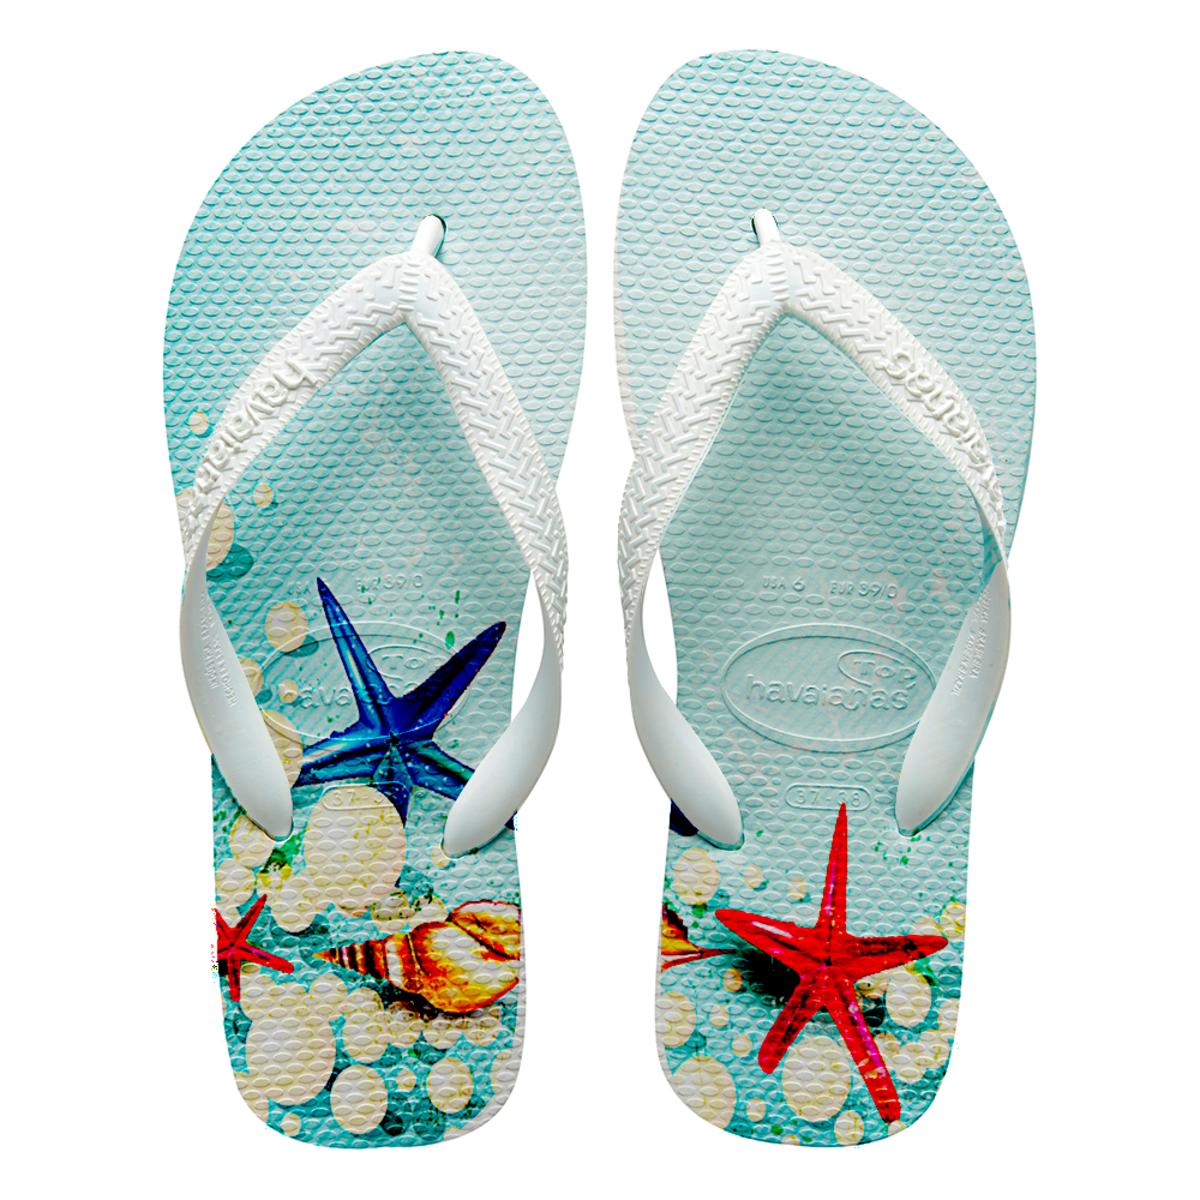 a63c428733 Chinelos havaianas personalizados Praia fundo do mar no Elo7 ...